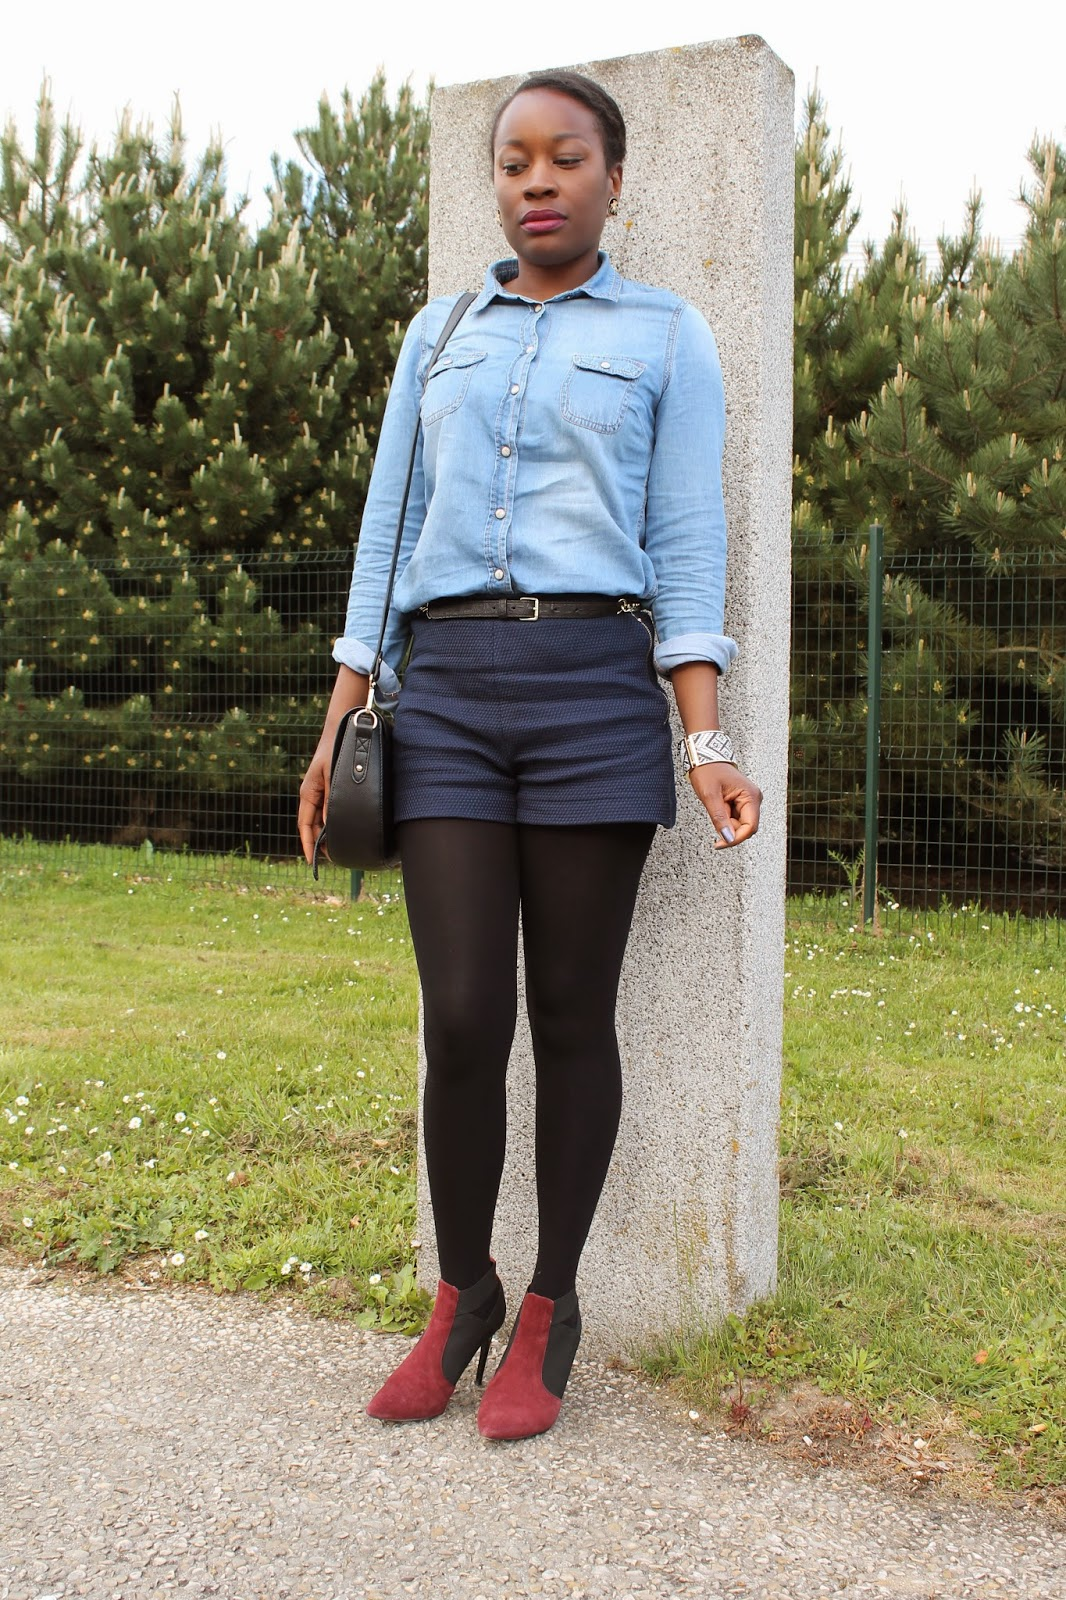 blogmode-tendance-chic-cheveuxcrepus-kinkyhair-fashionblogger-chemiseenjeans-shortchic-zara-h&m-mim-